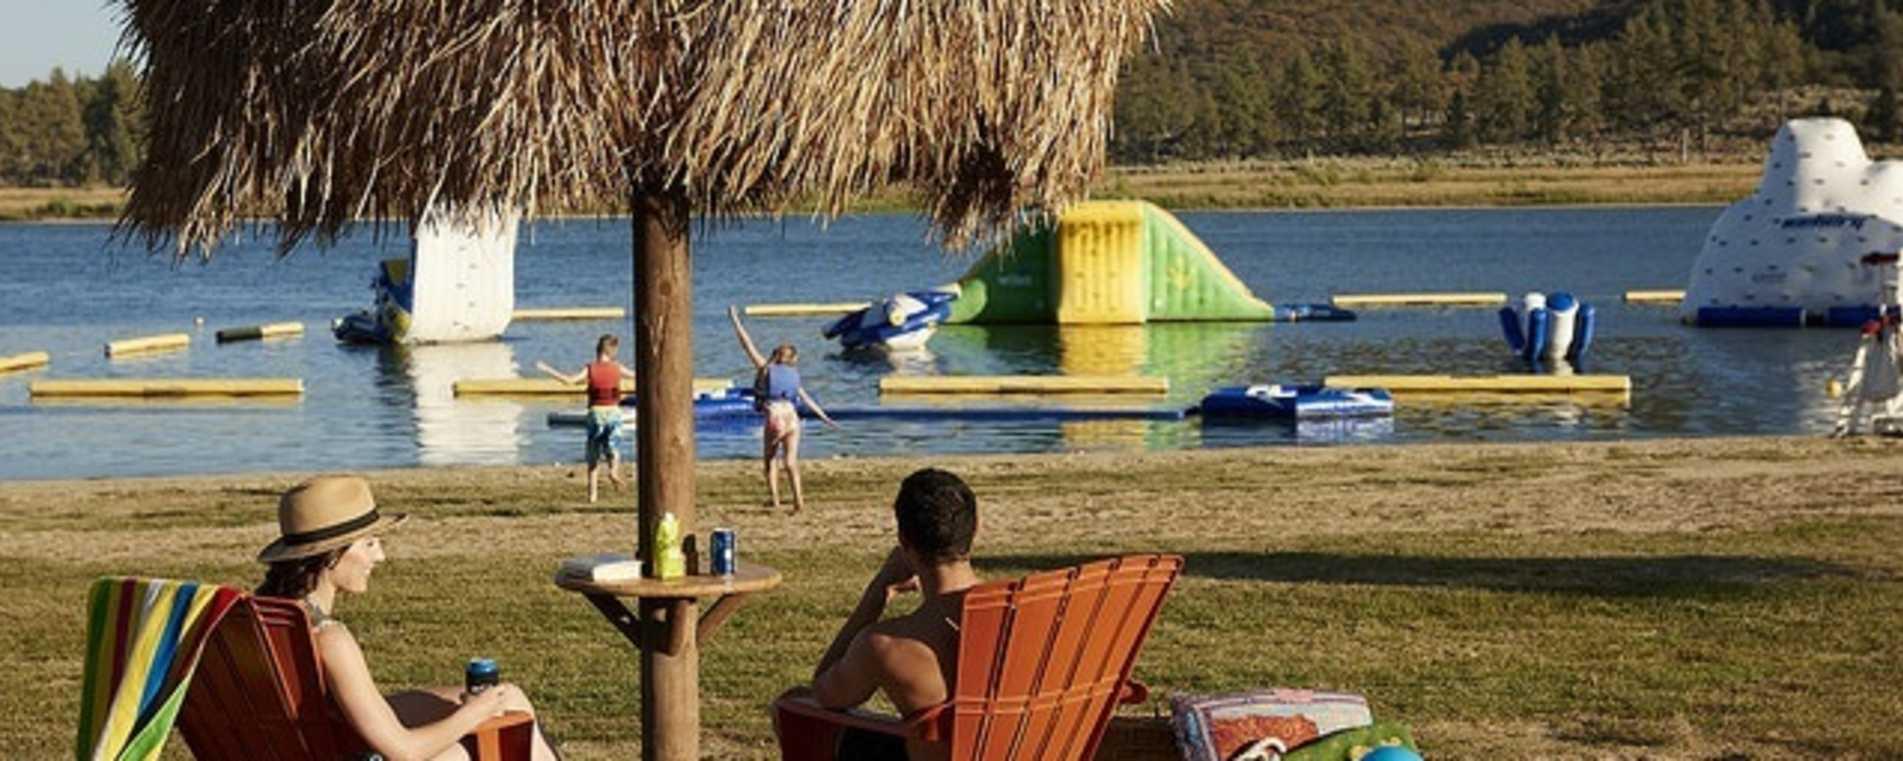 Water Park - Lake Hemet